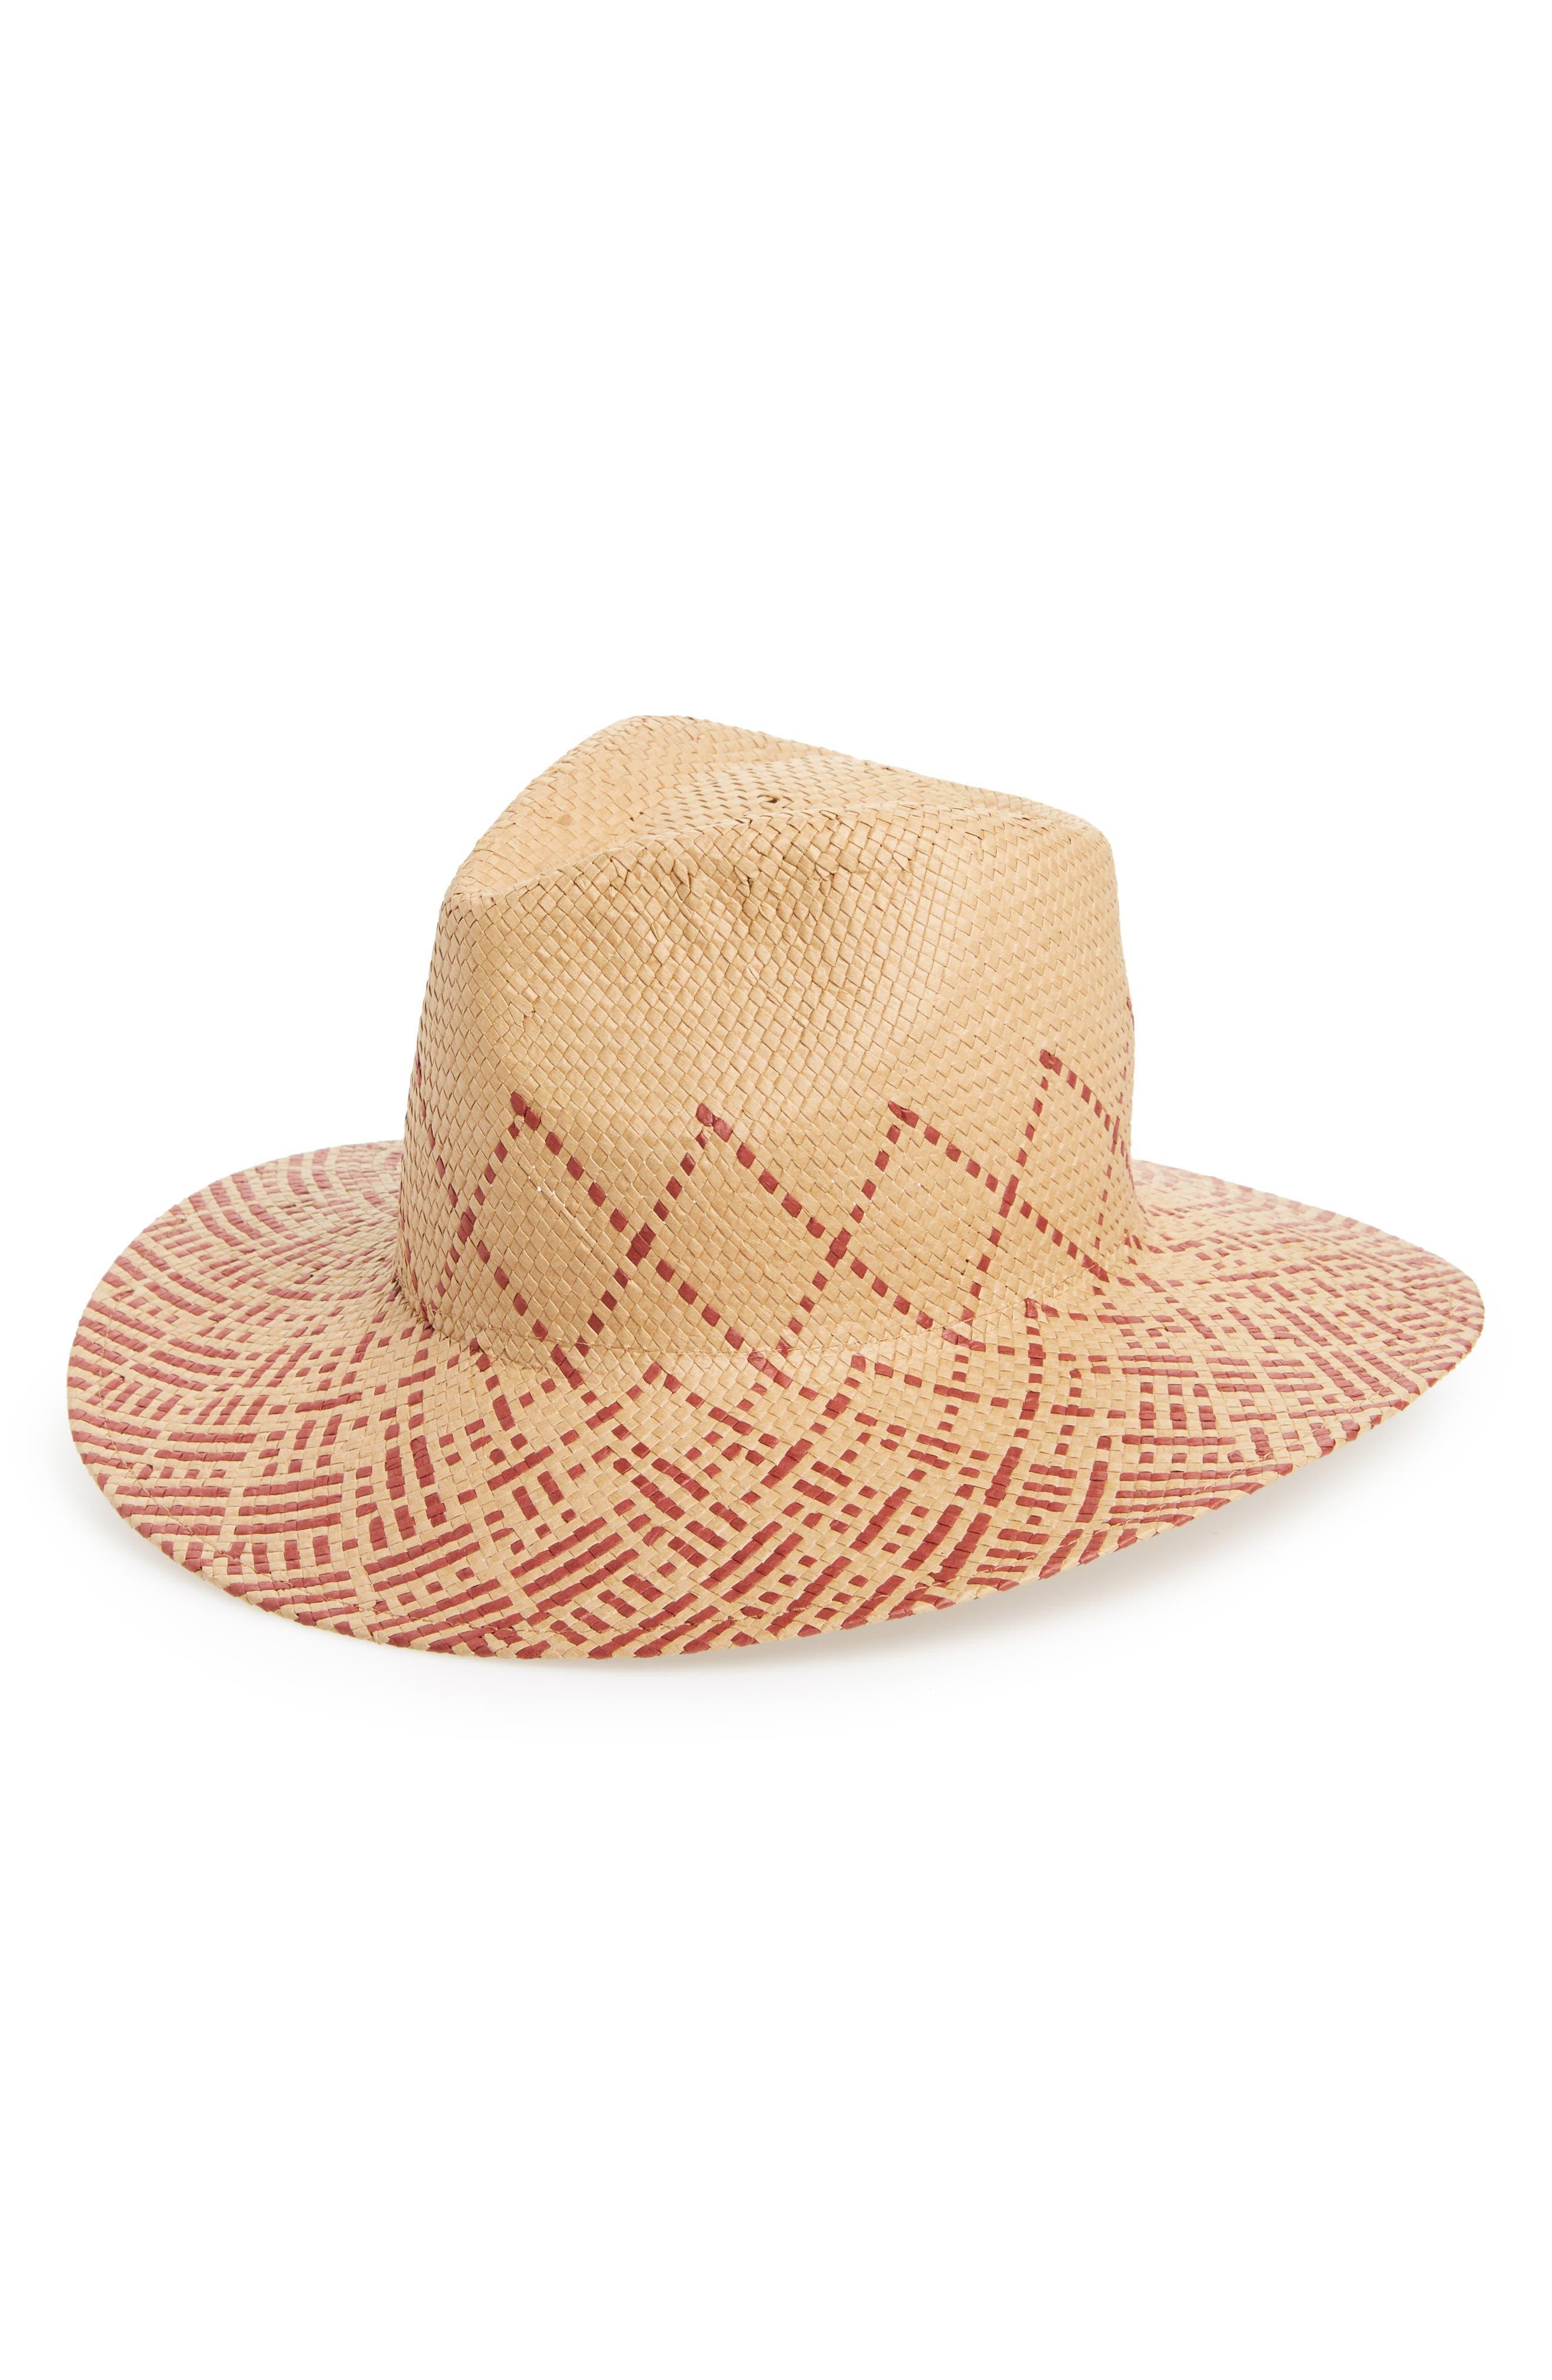 BP. Two-Tone Straw Hat